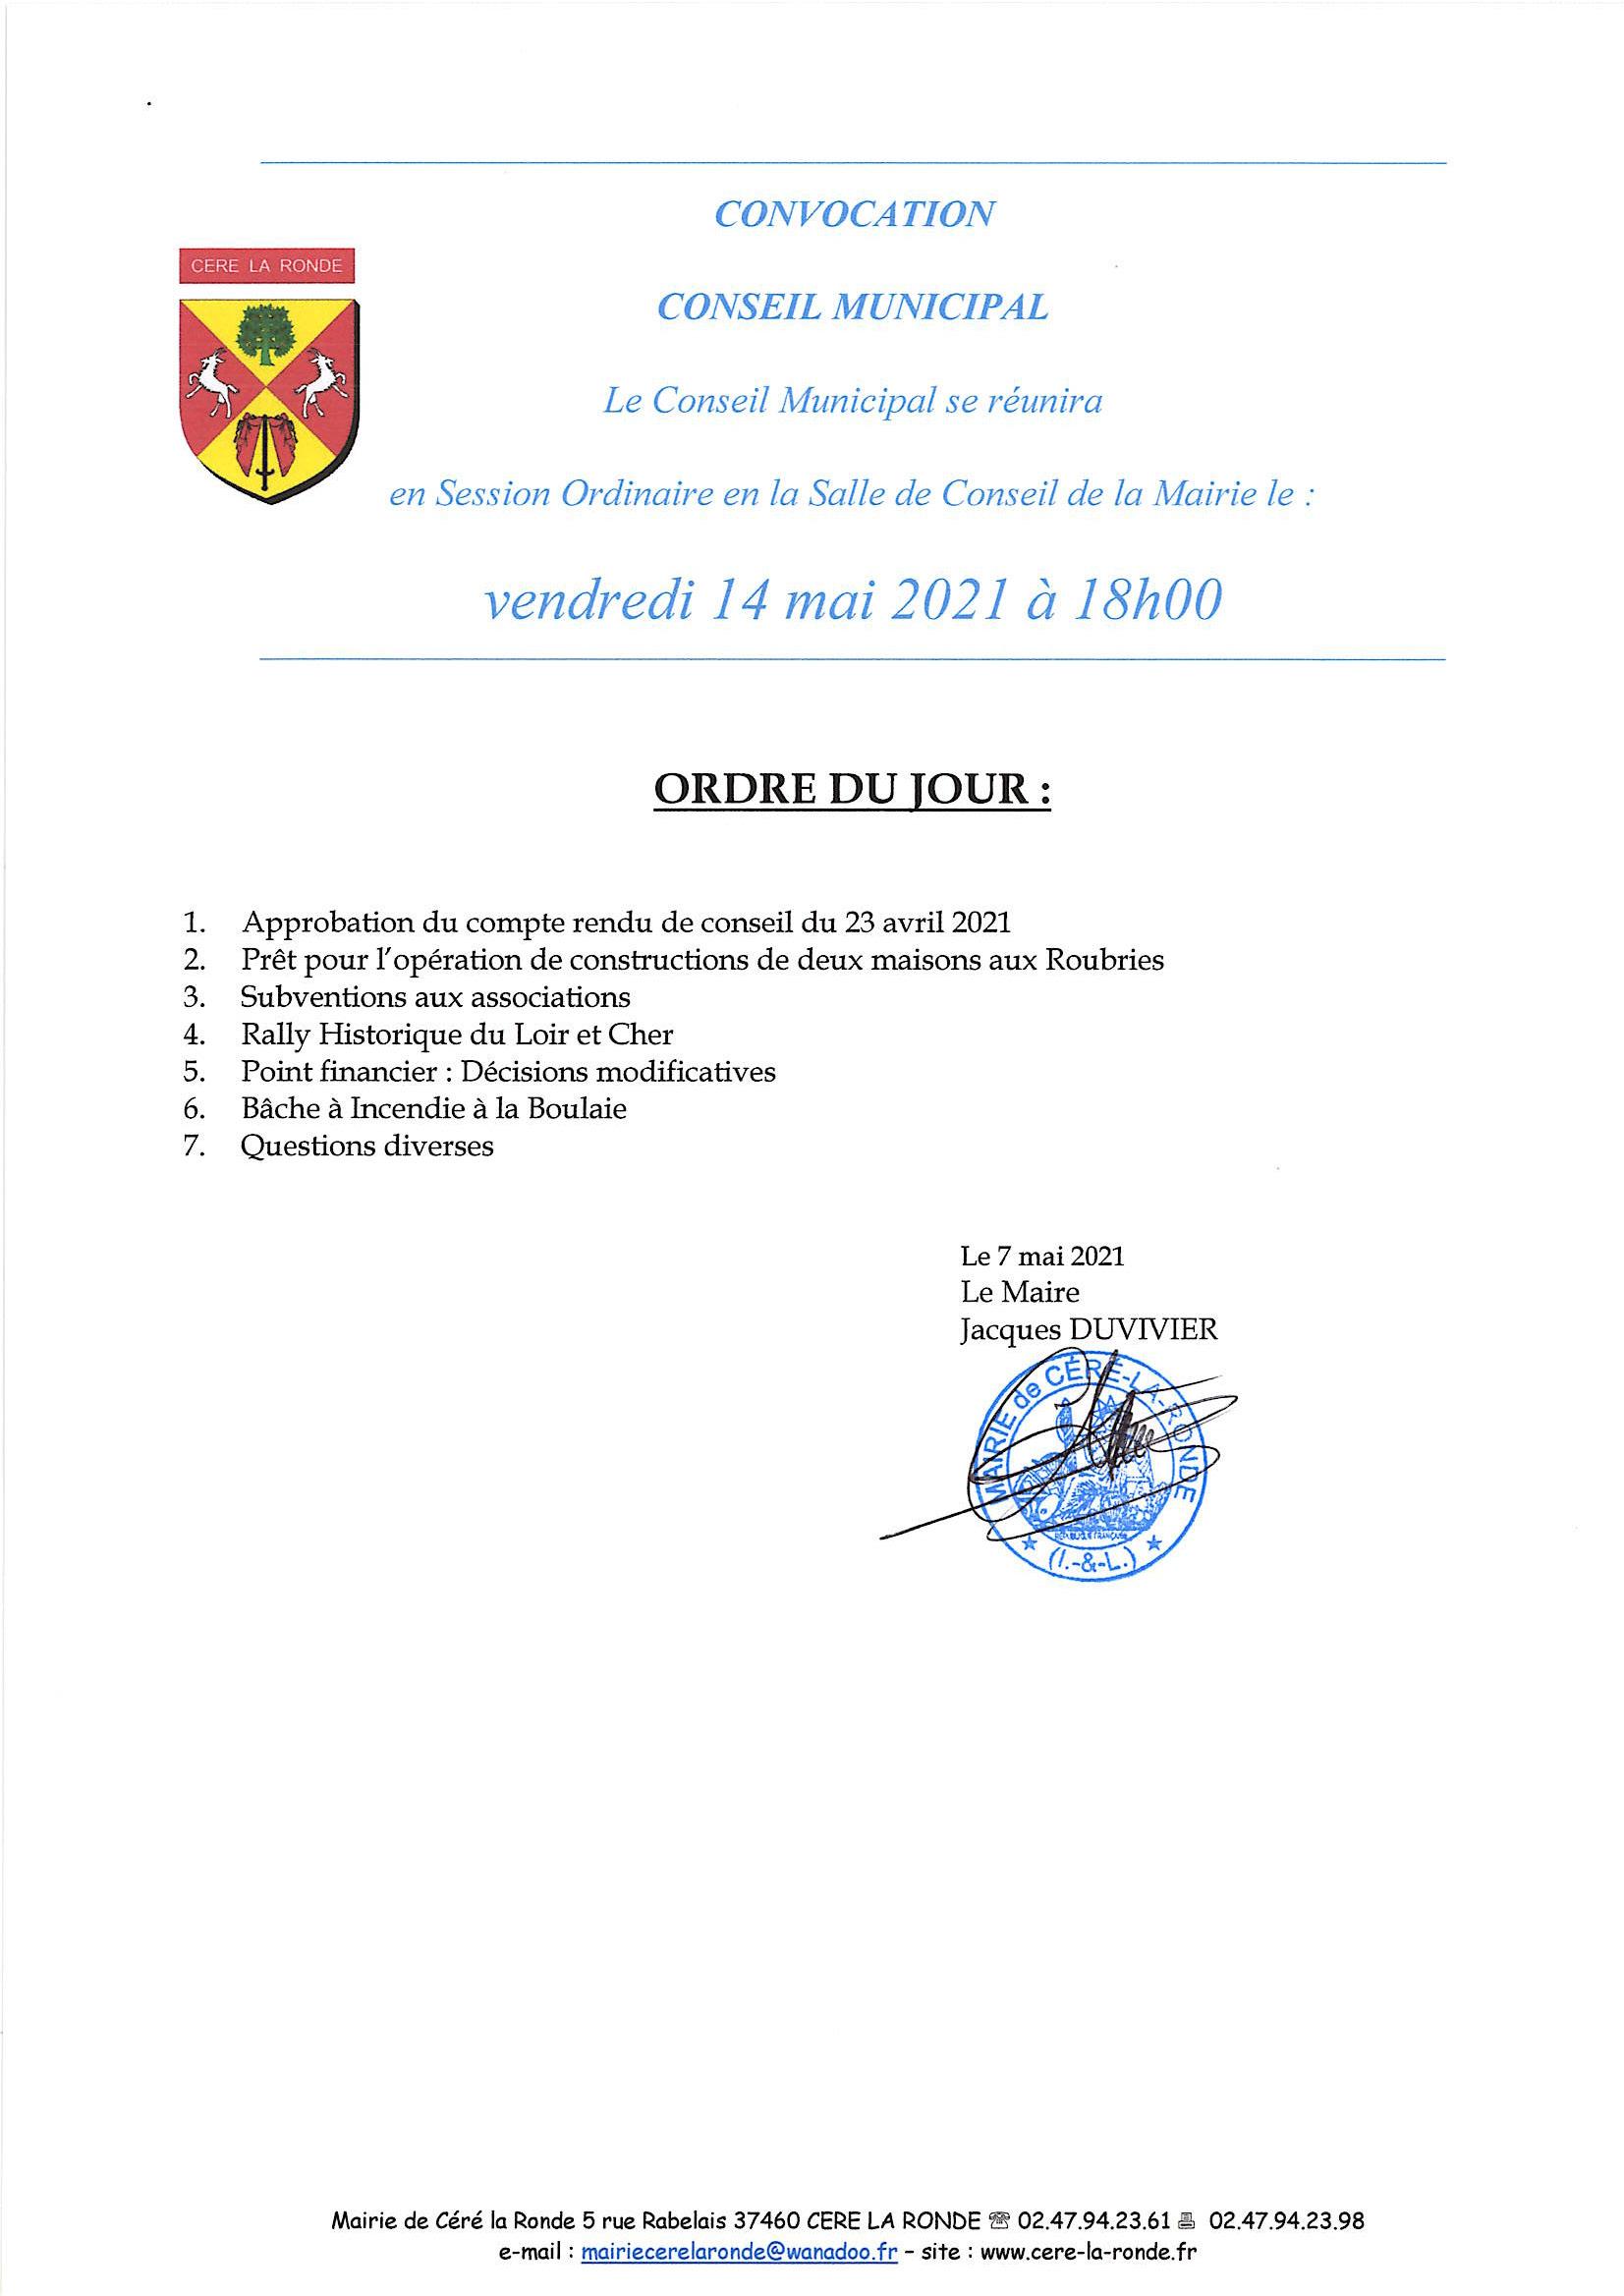 céré la ronde conseil municipal 14 mai 2021